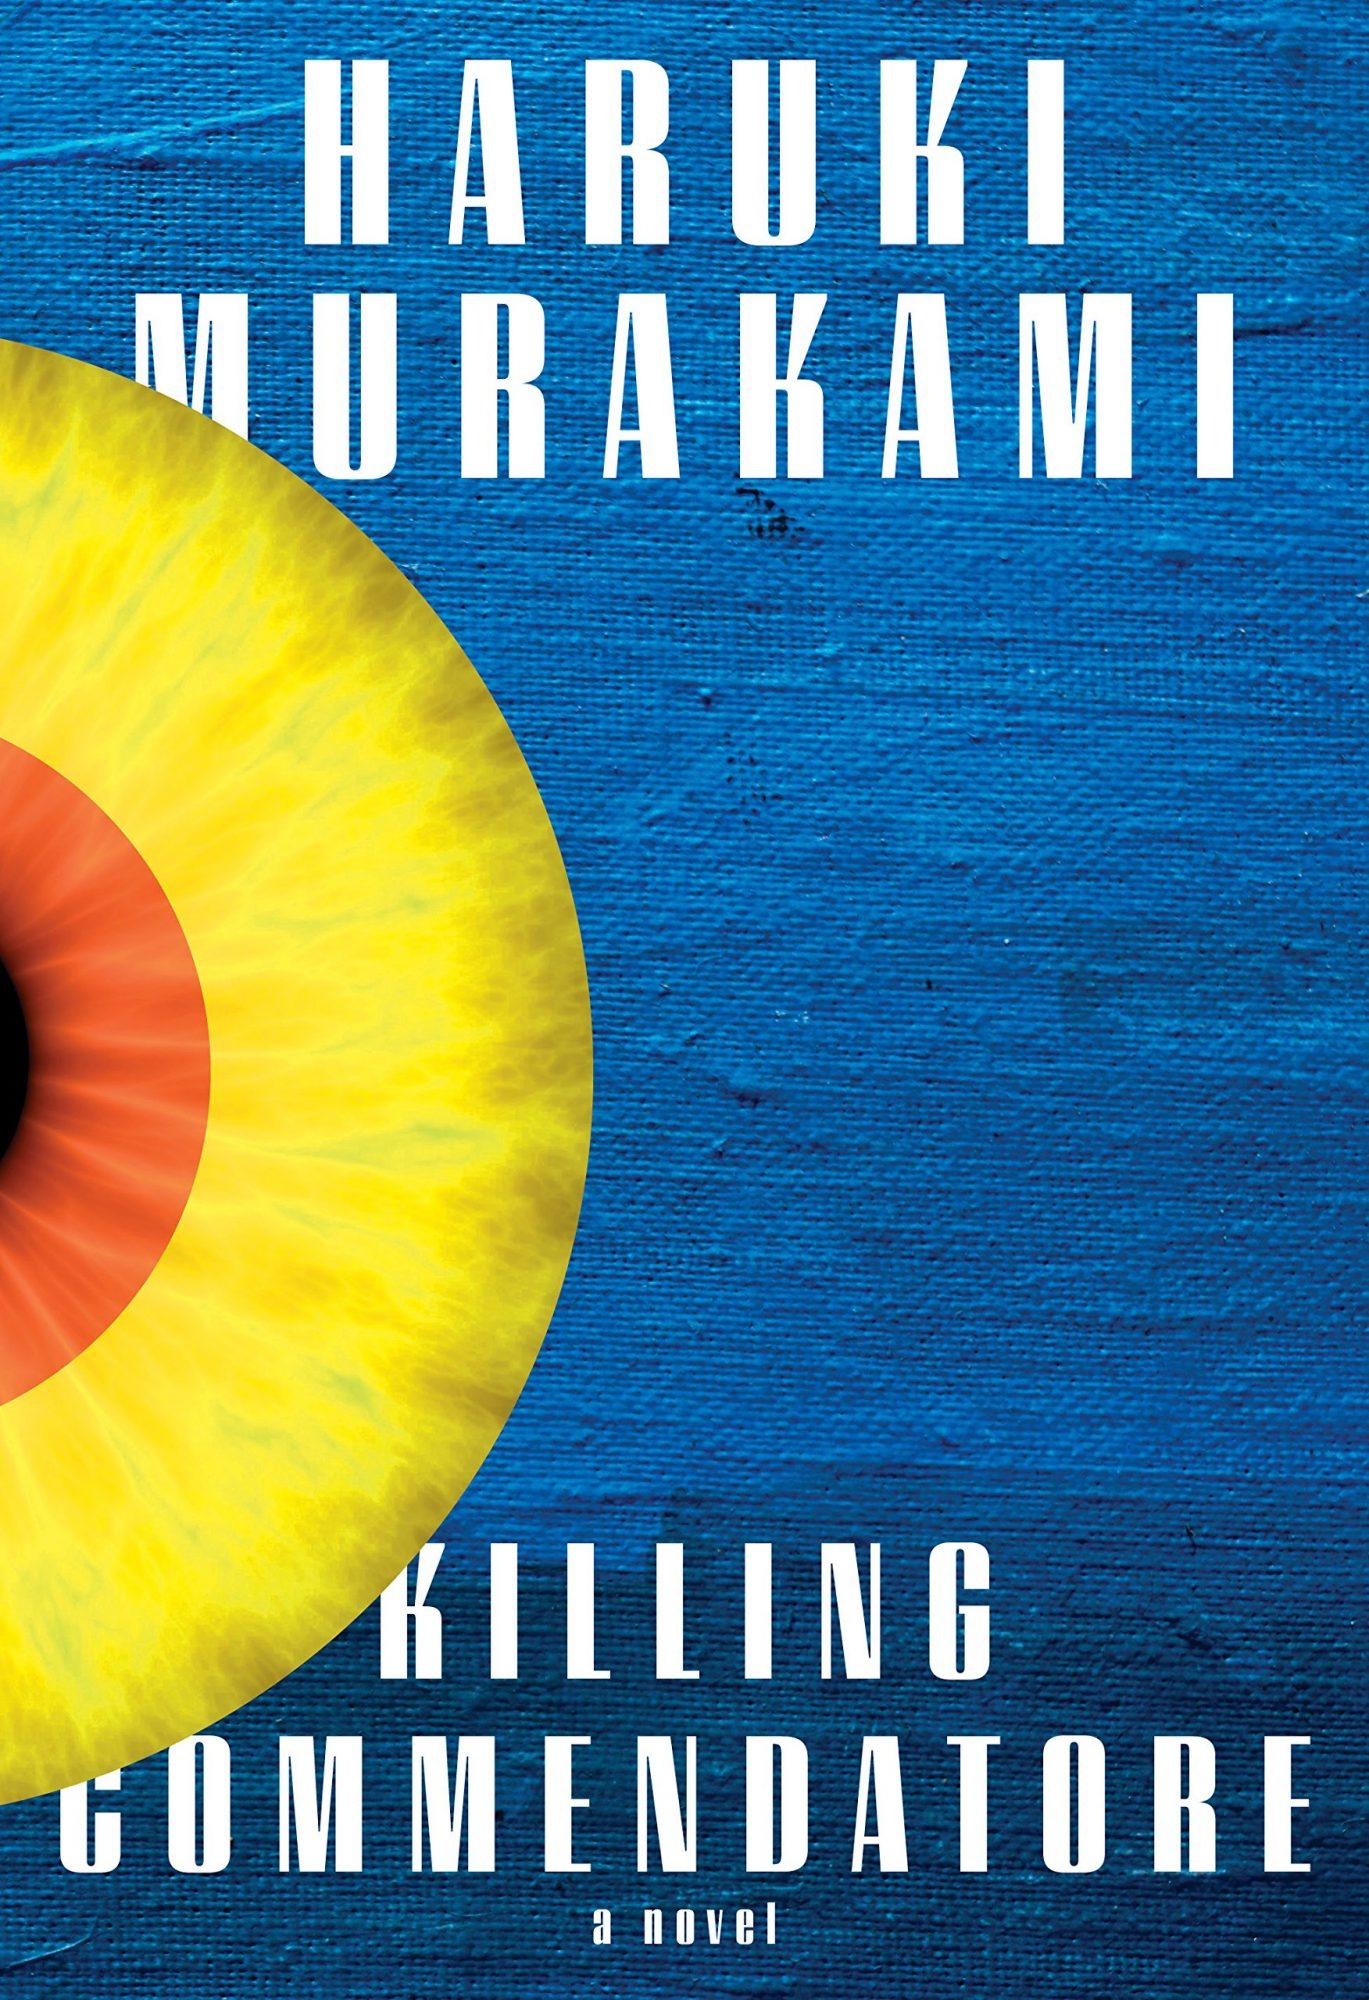 Haruki Murakami, Killing CommendatoreCR: Knopf